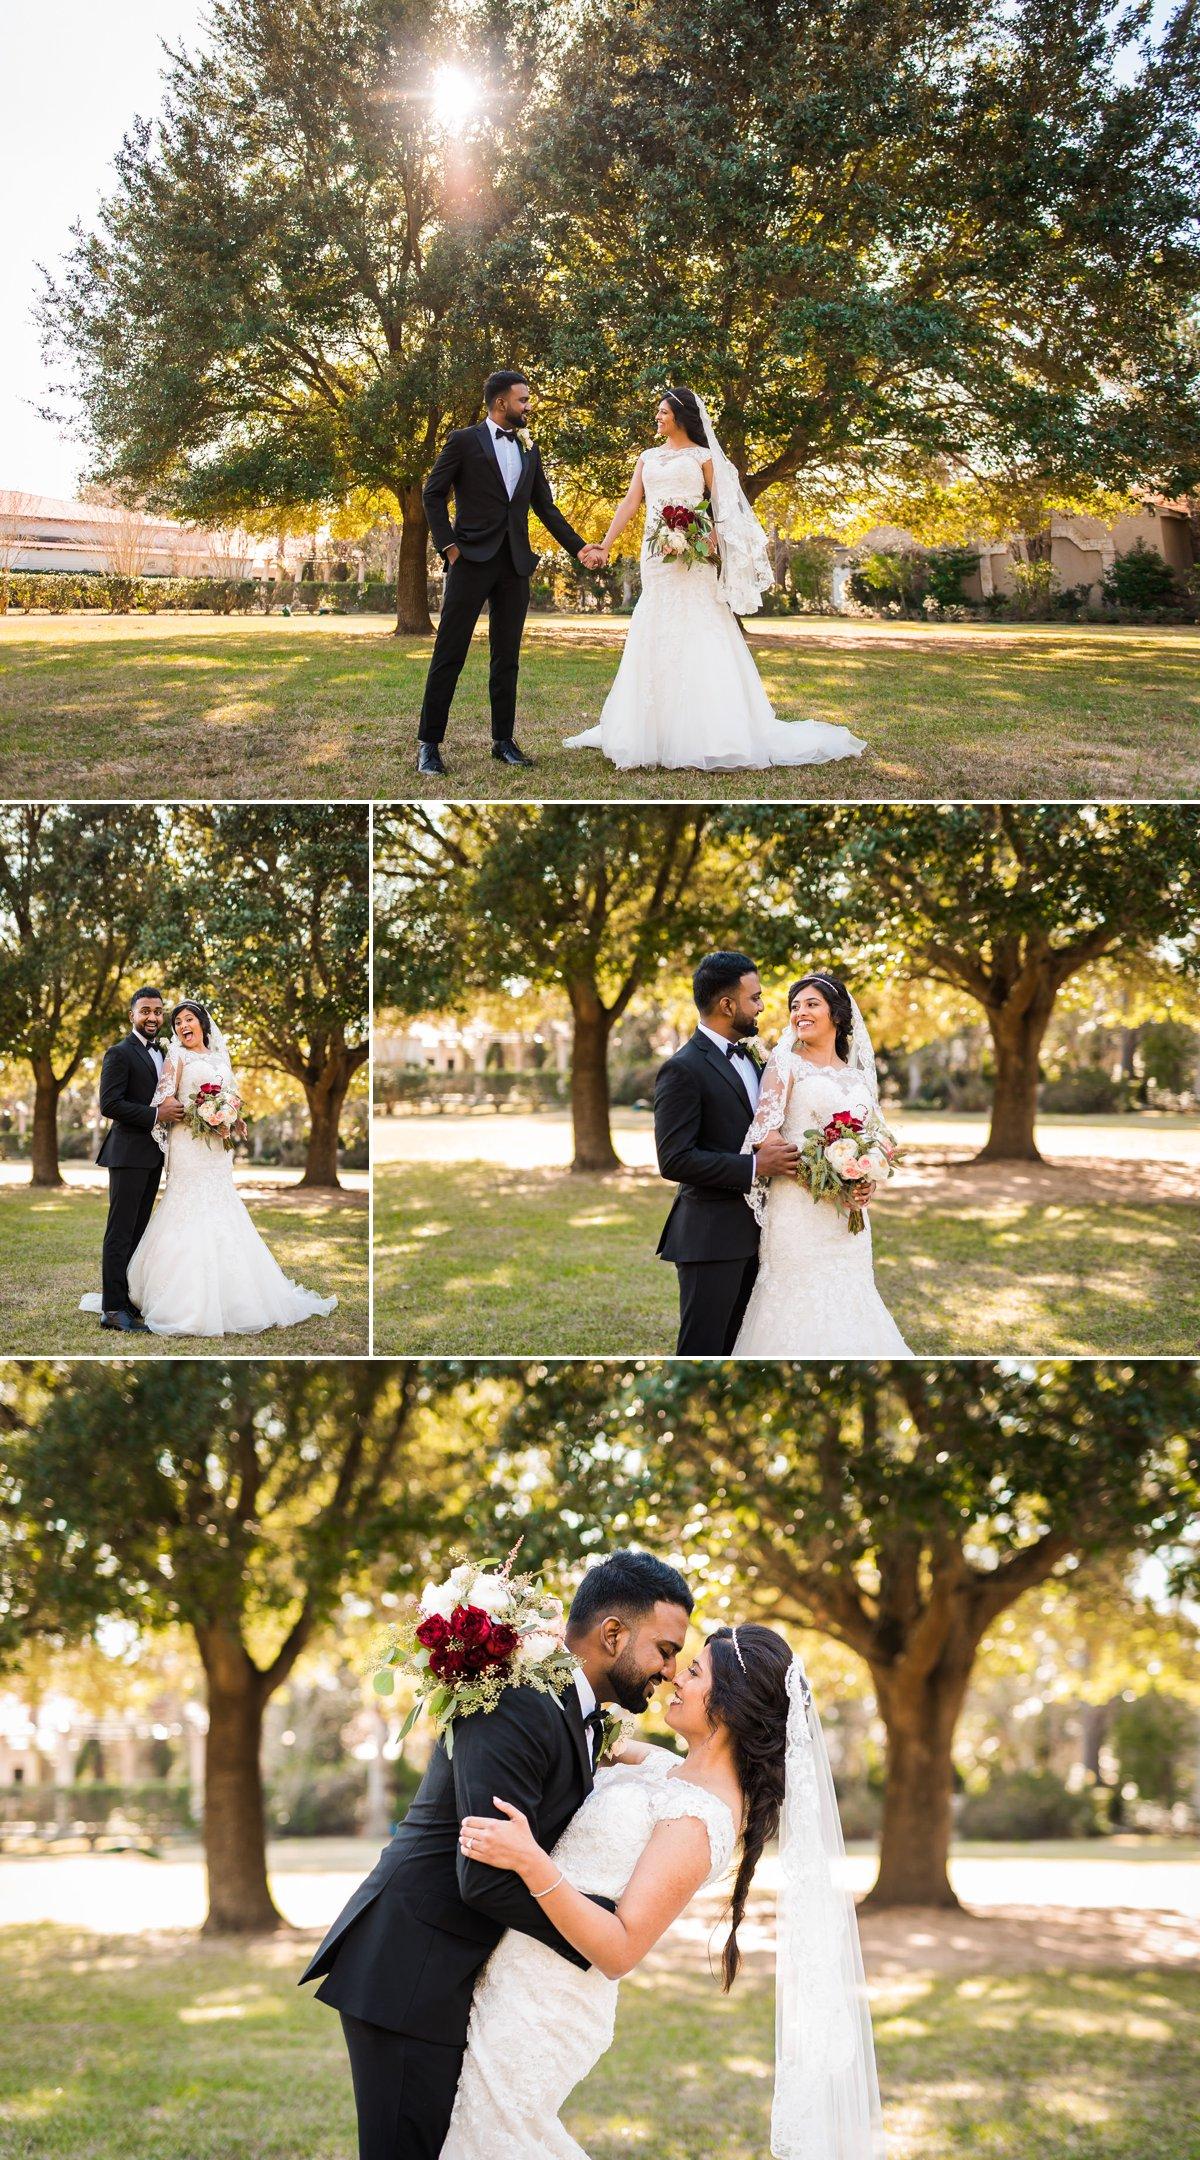 Grace-Allen Houston bridal Photos by Nate Messarra